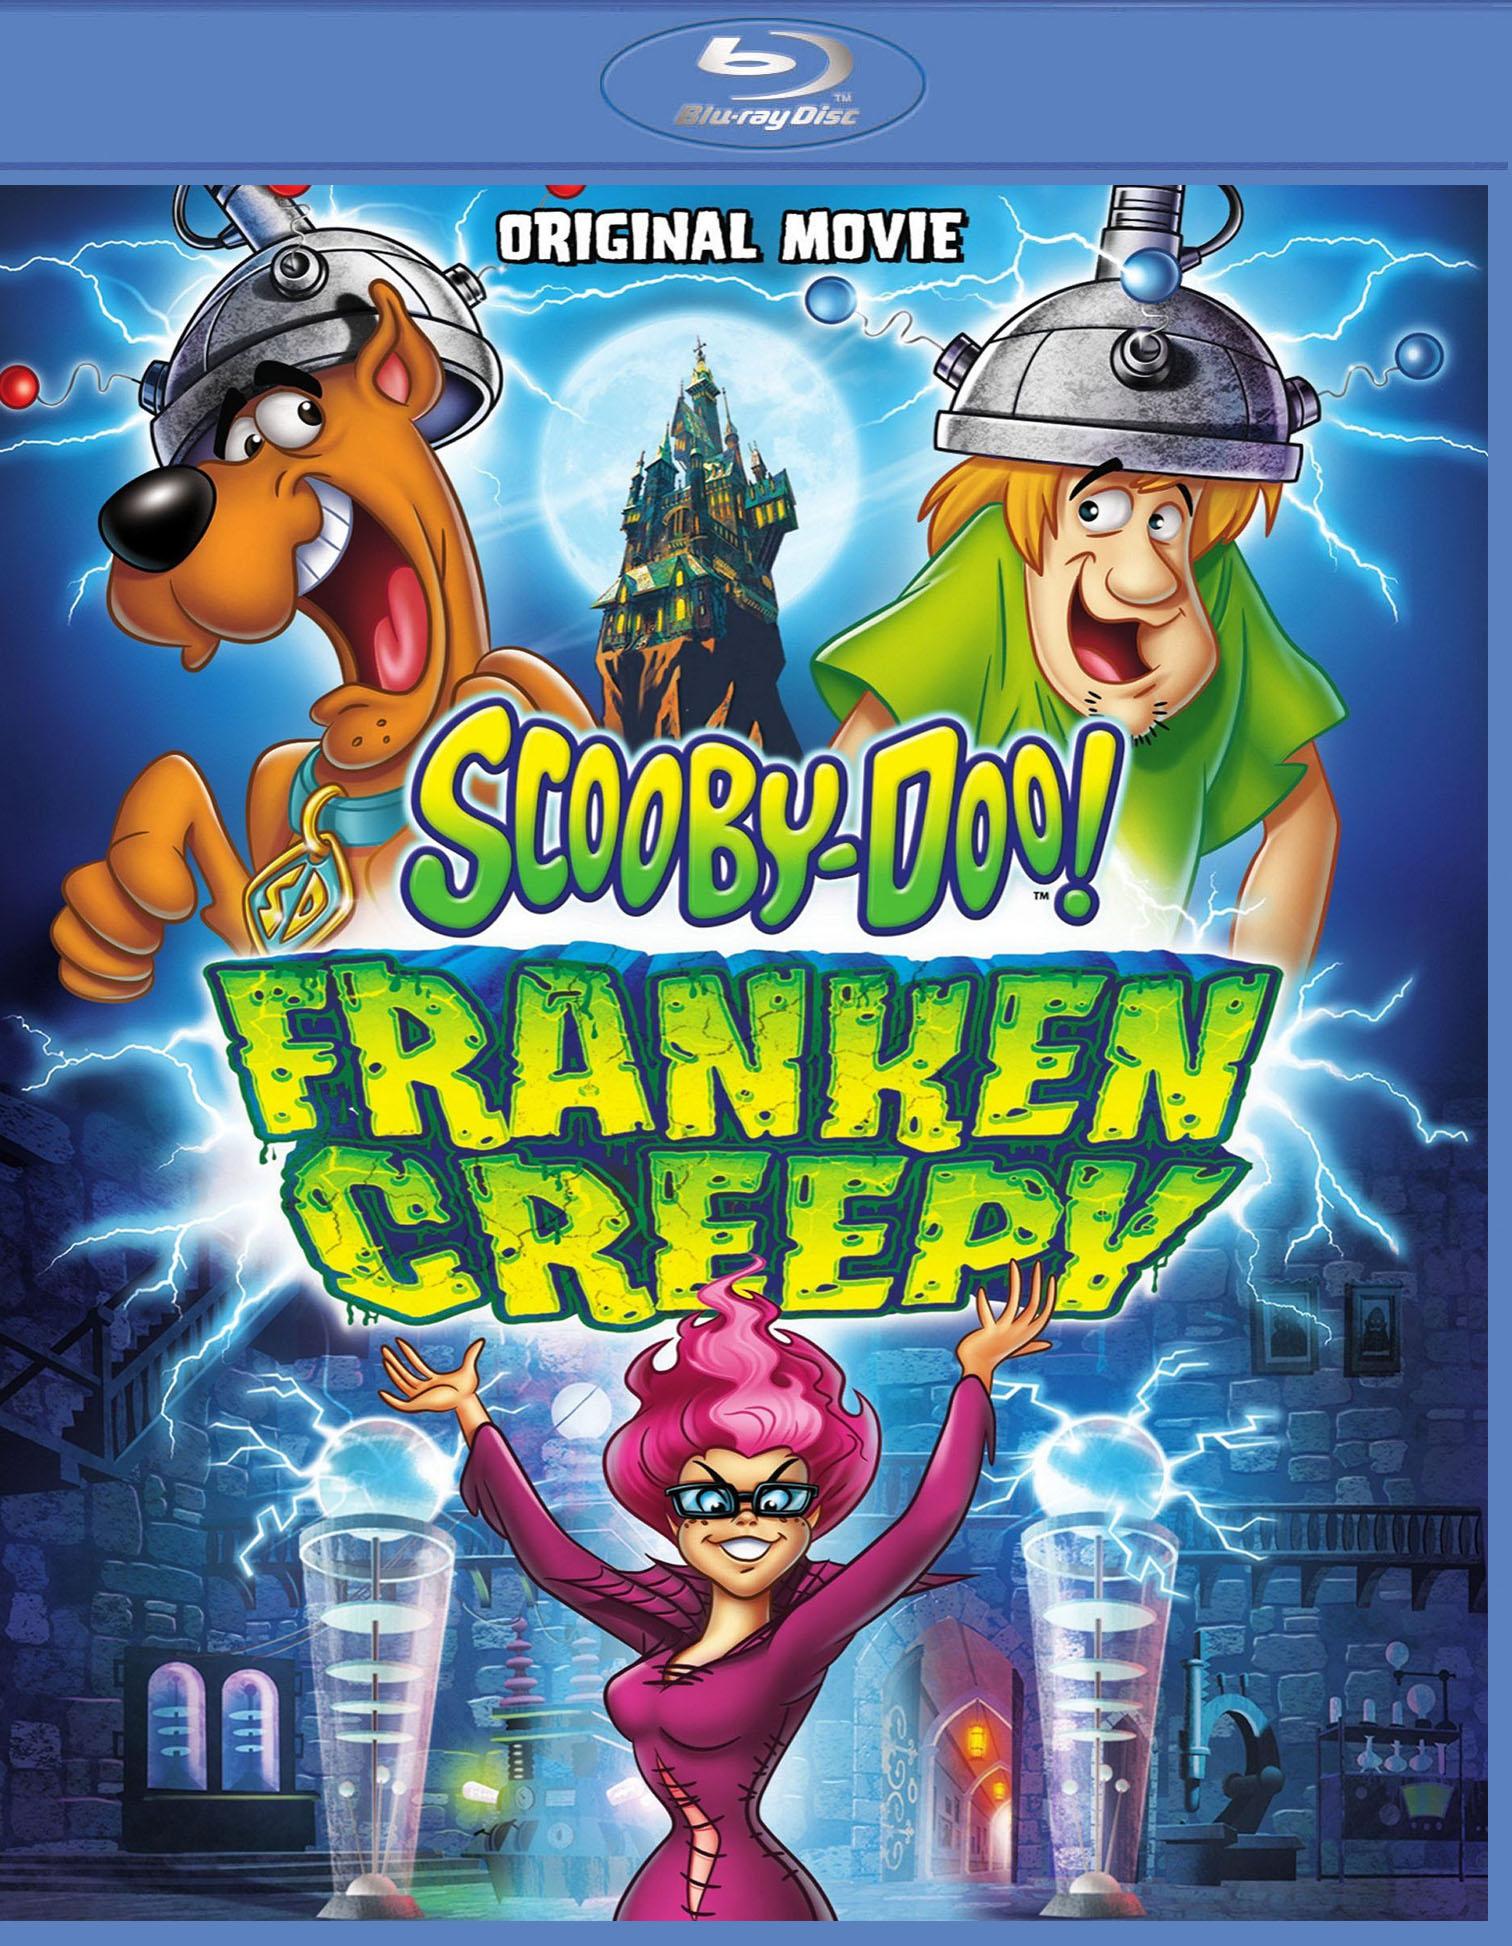 Scooby-doo!: Frankencreepy [2 Discs] [blu-ray/dvd] 7425288